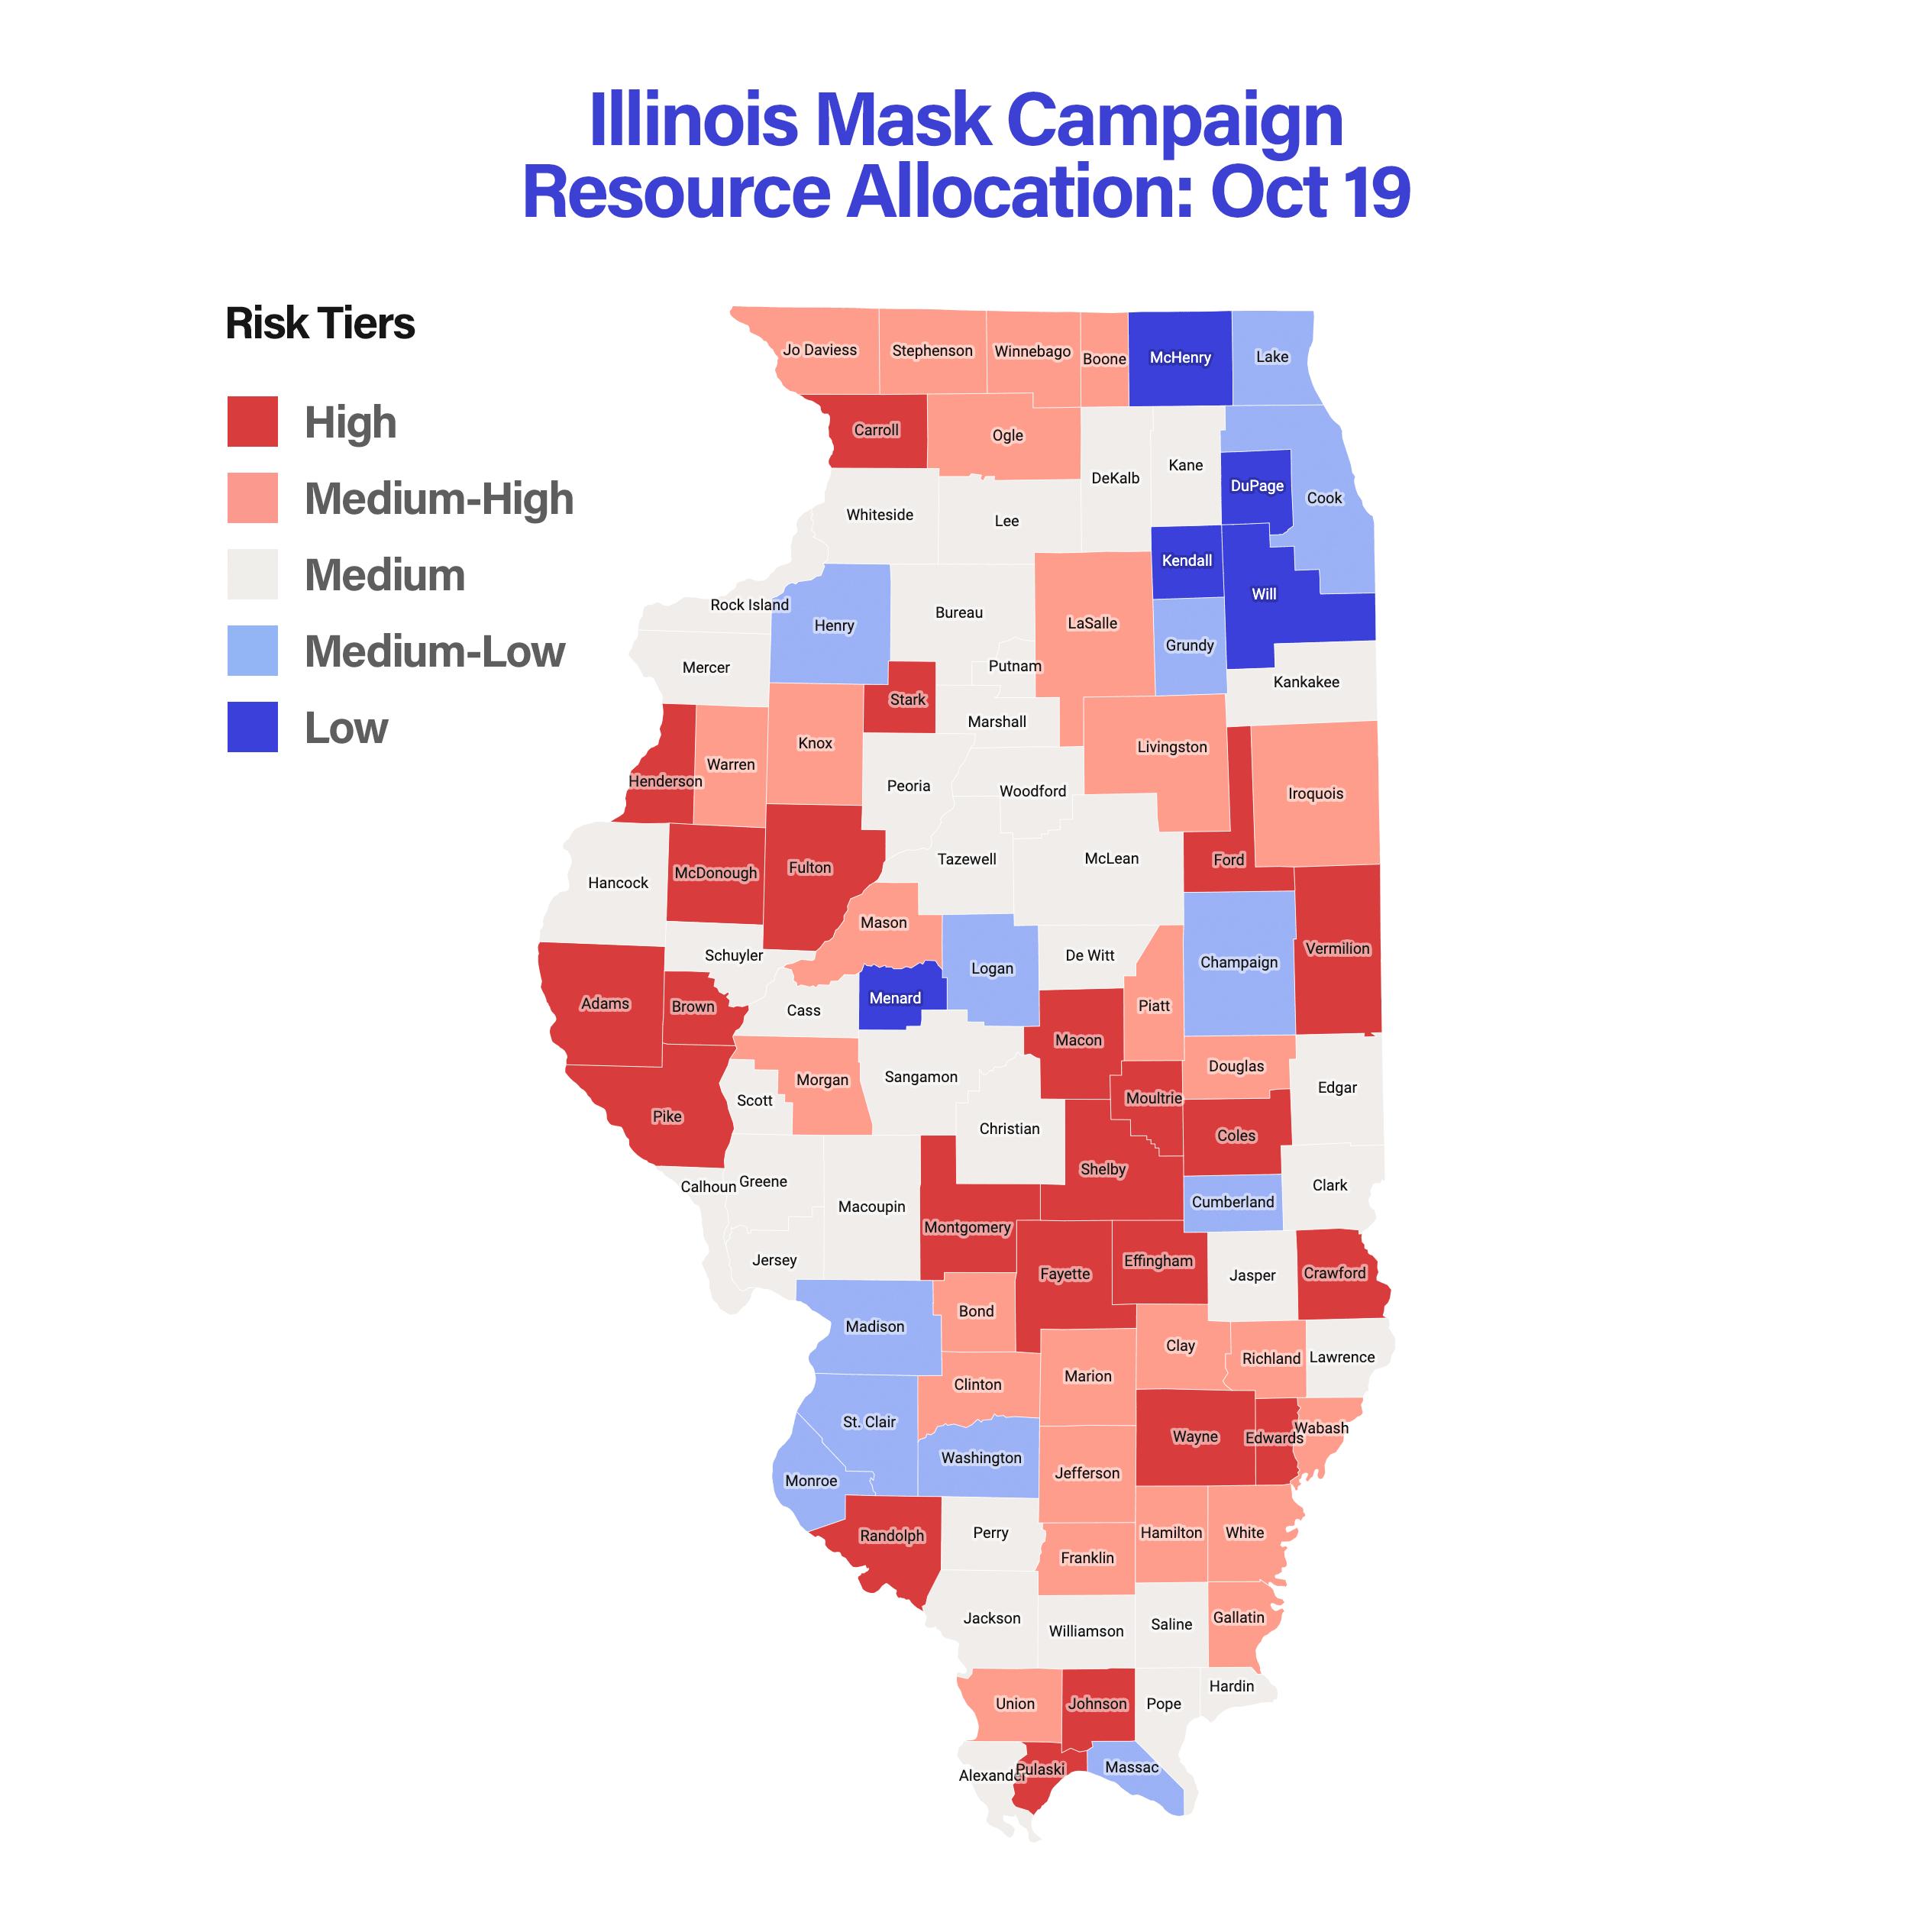 Illinois Mask Campaign Resource Allocation: Oct 19